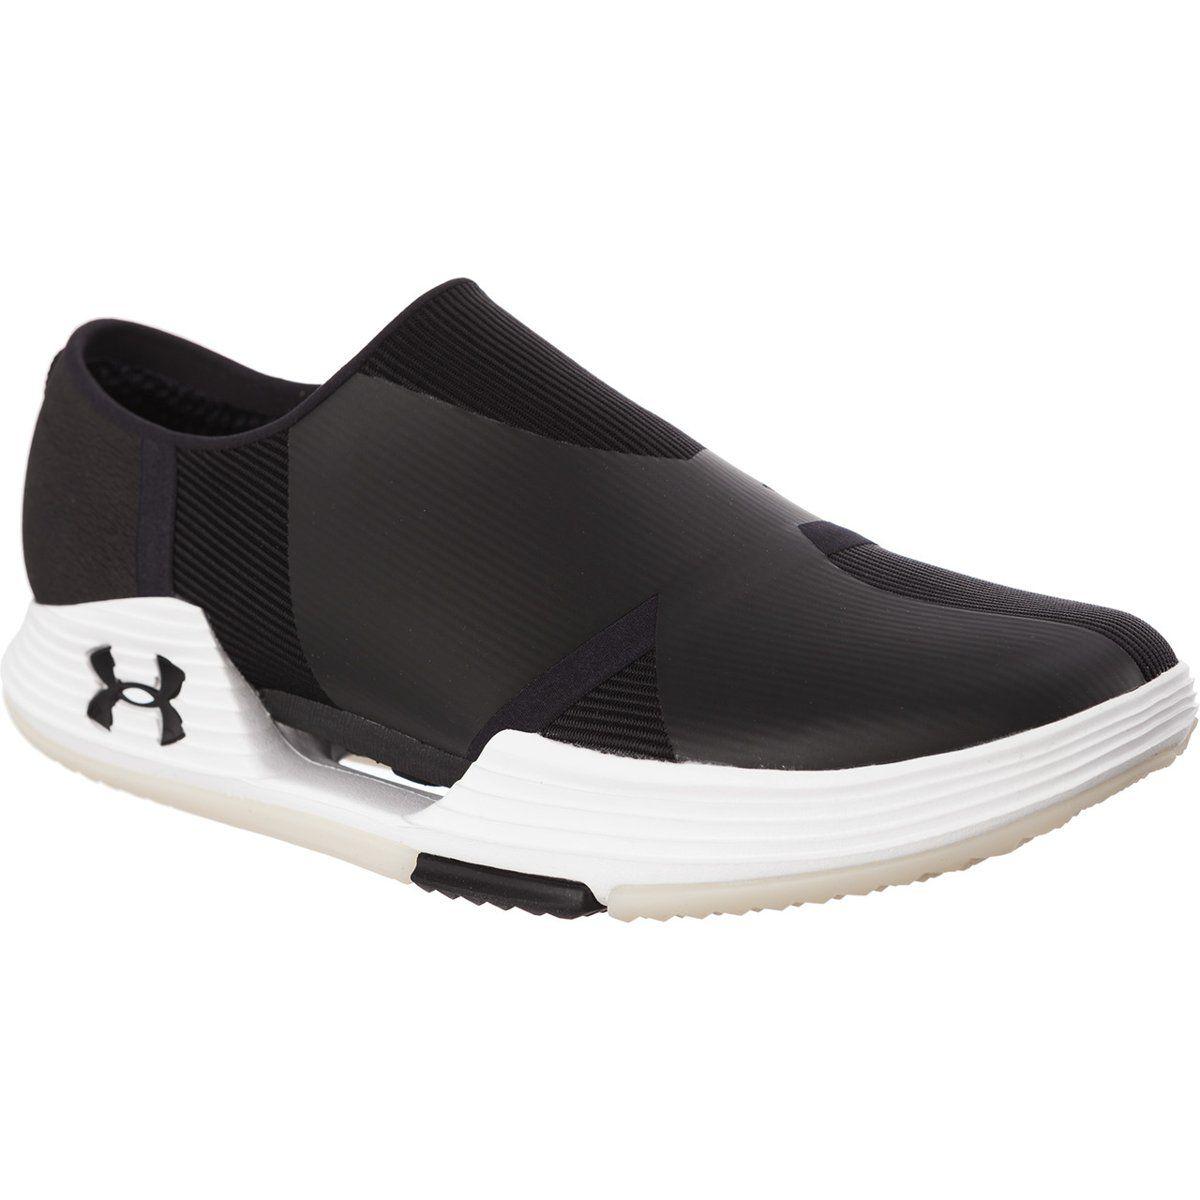 Sportowe Damskie Underarmour Under Armour Czarne Speedform Amp 2 0 Slip 001 Black Under Armour Slip On Sneaker Shoes